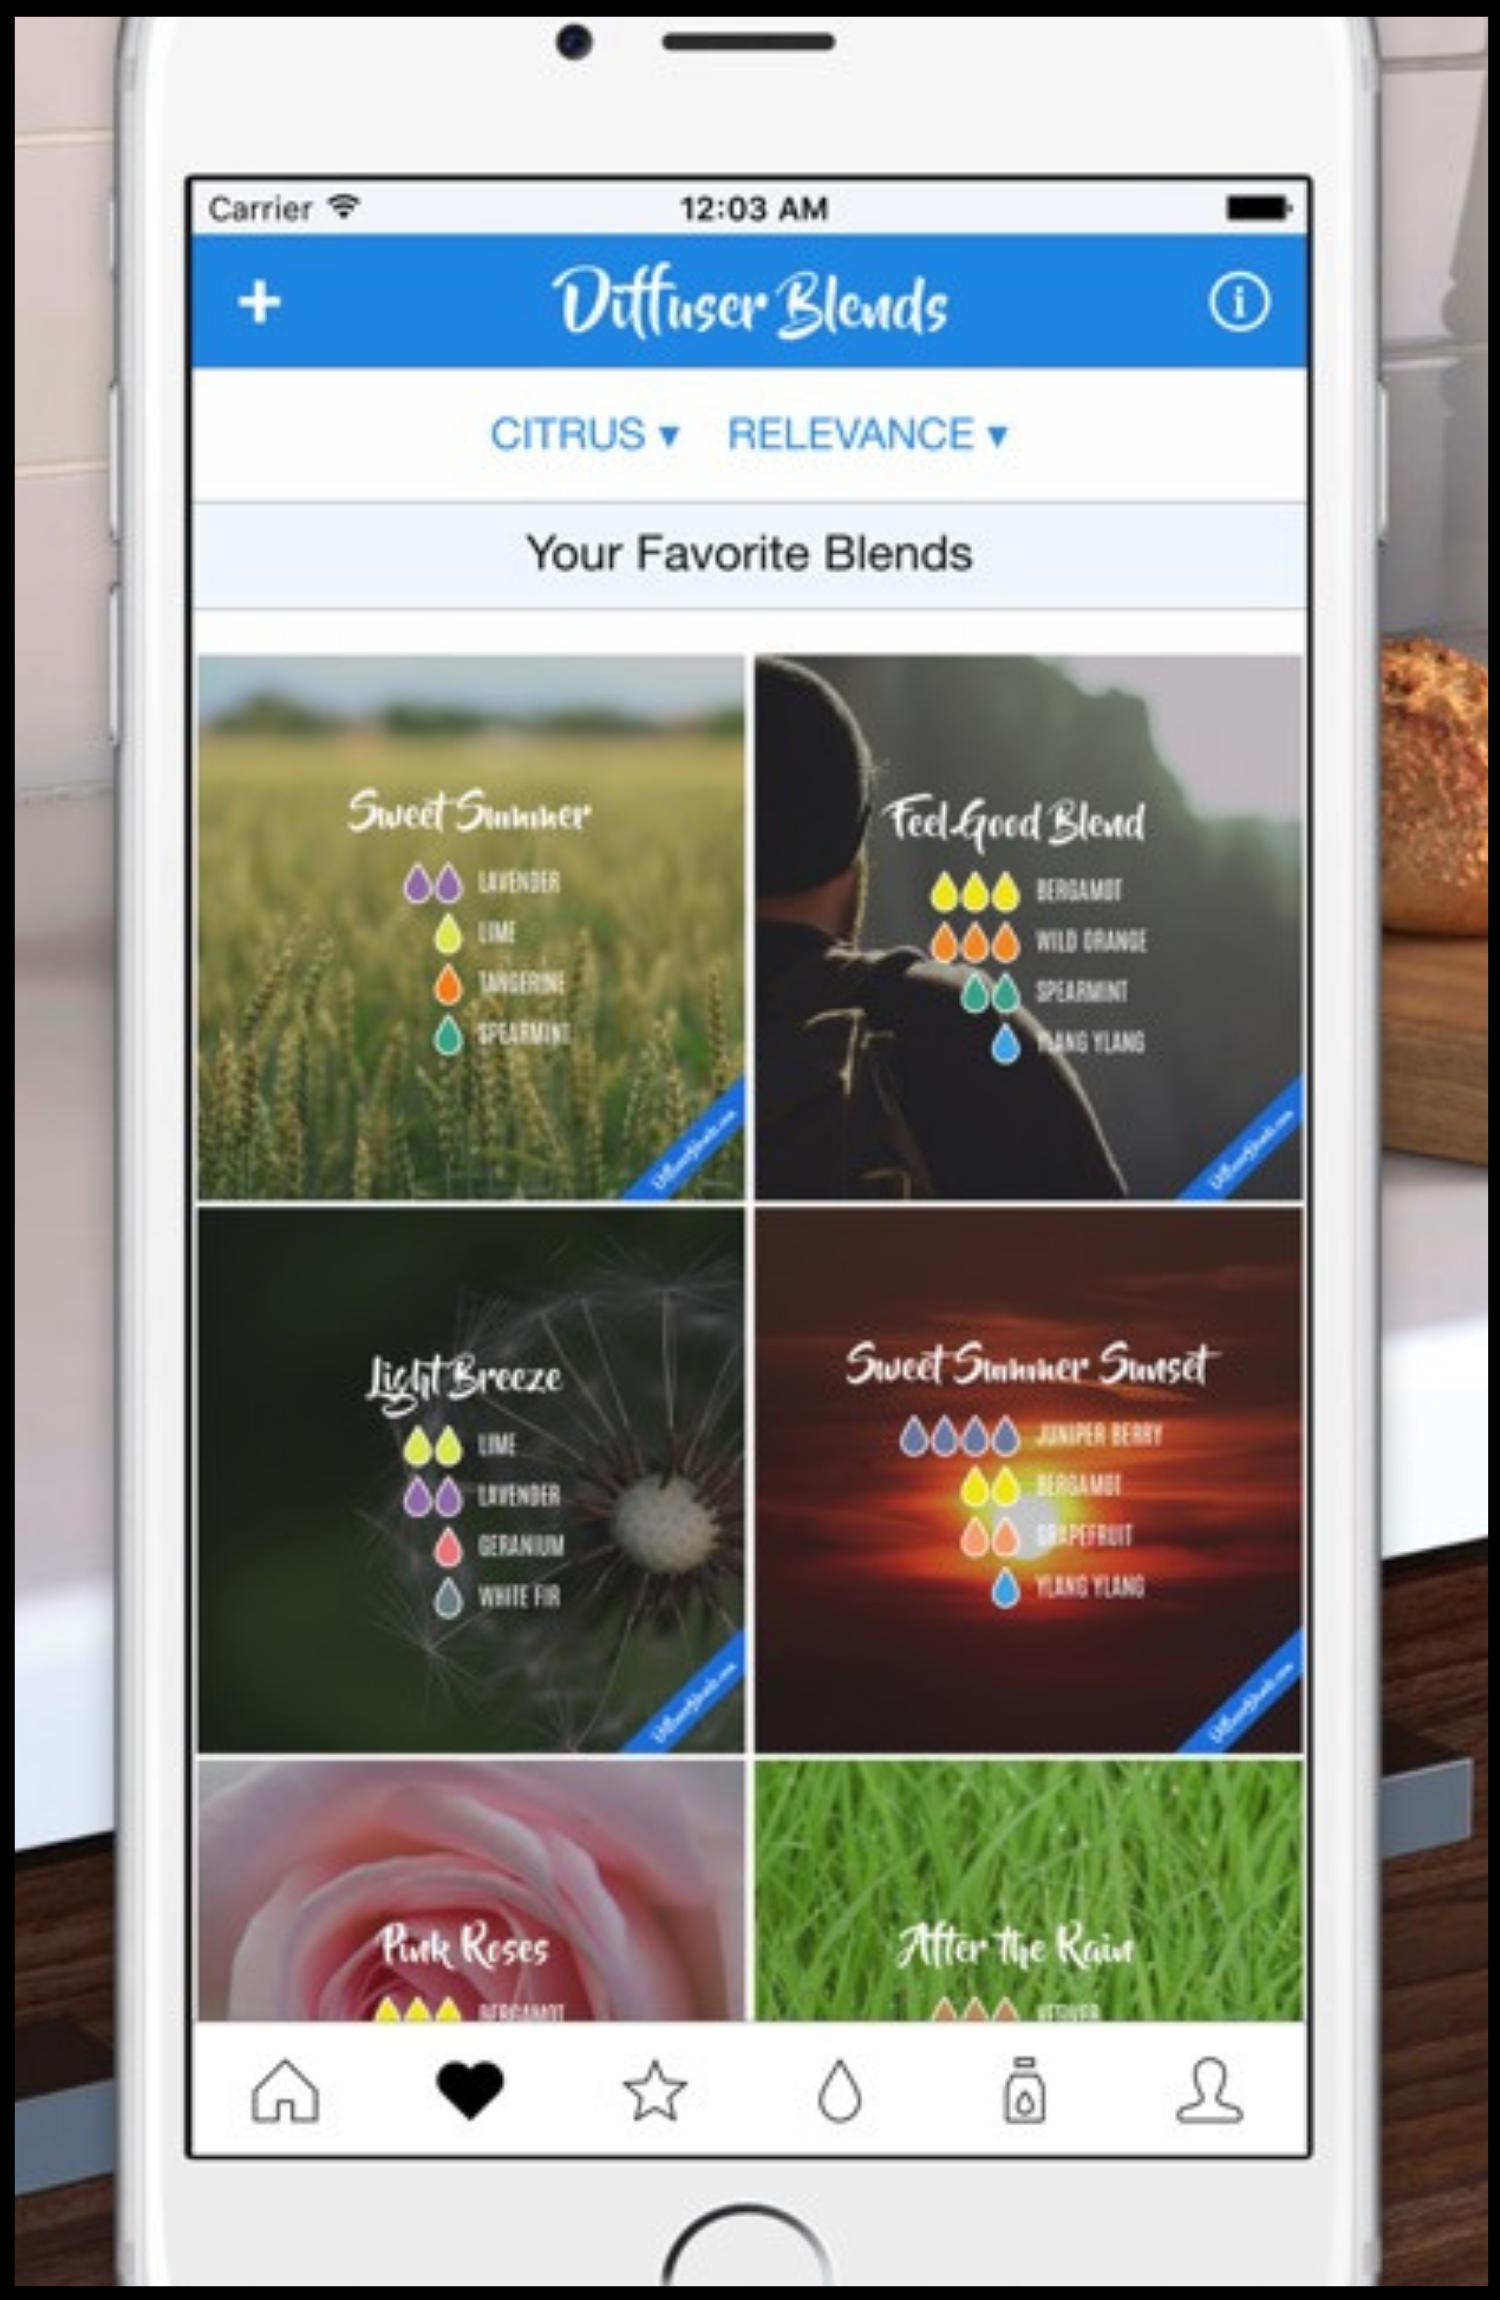 Diffuser Blends Website & App